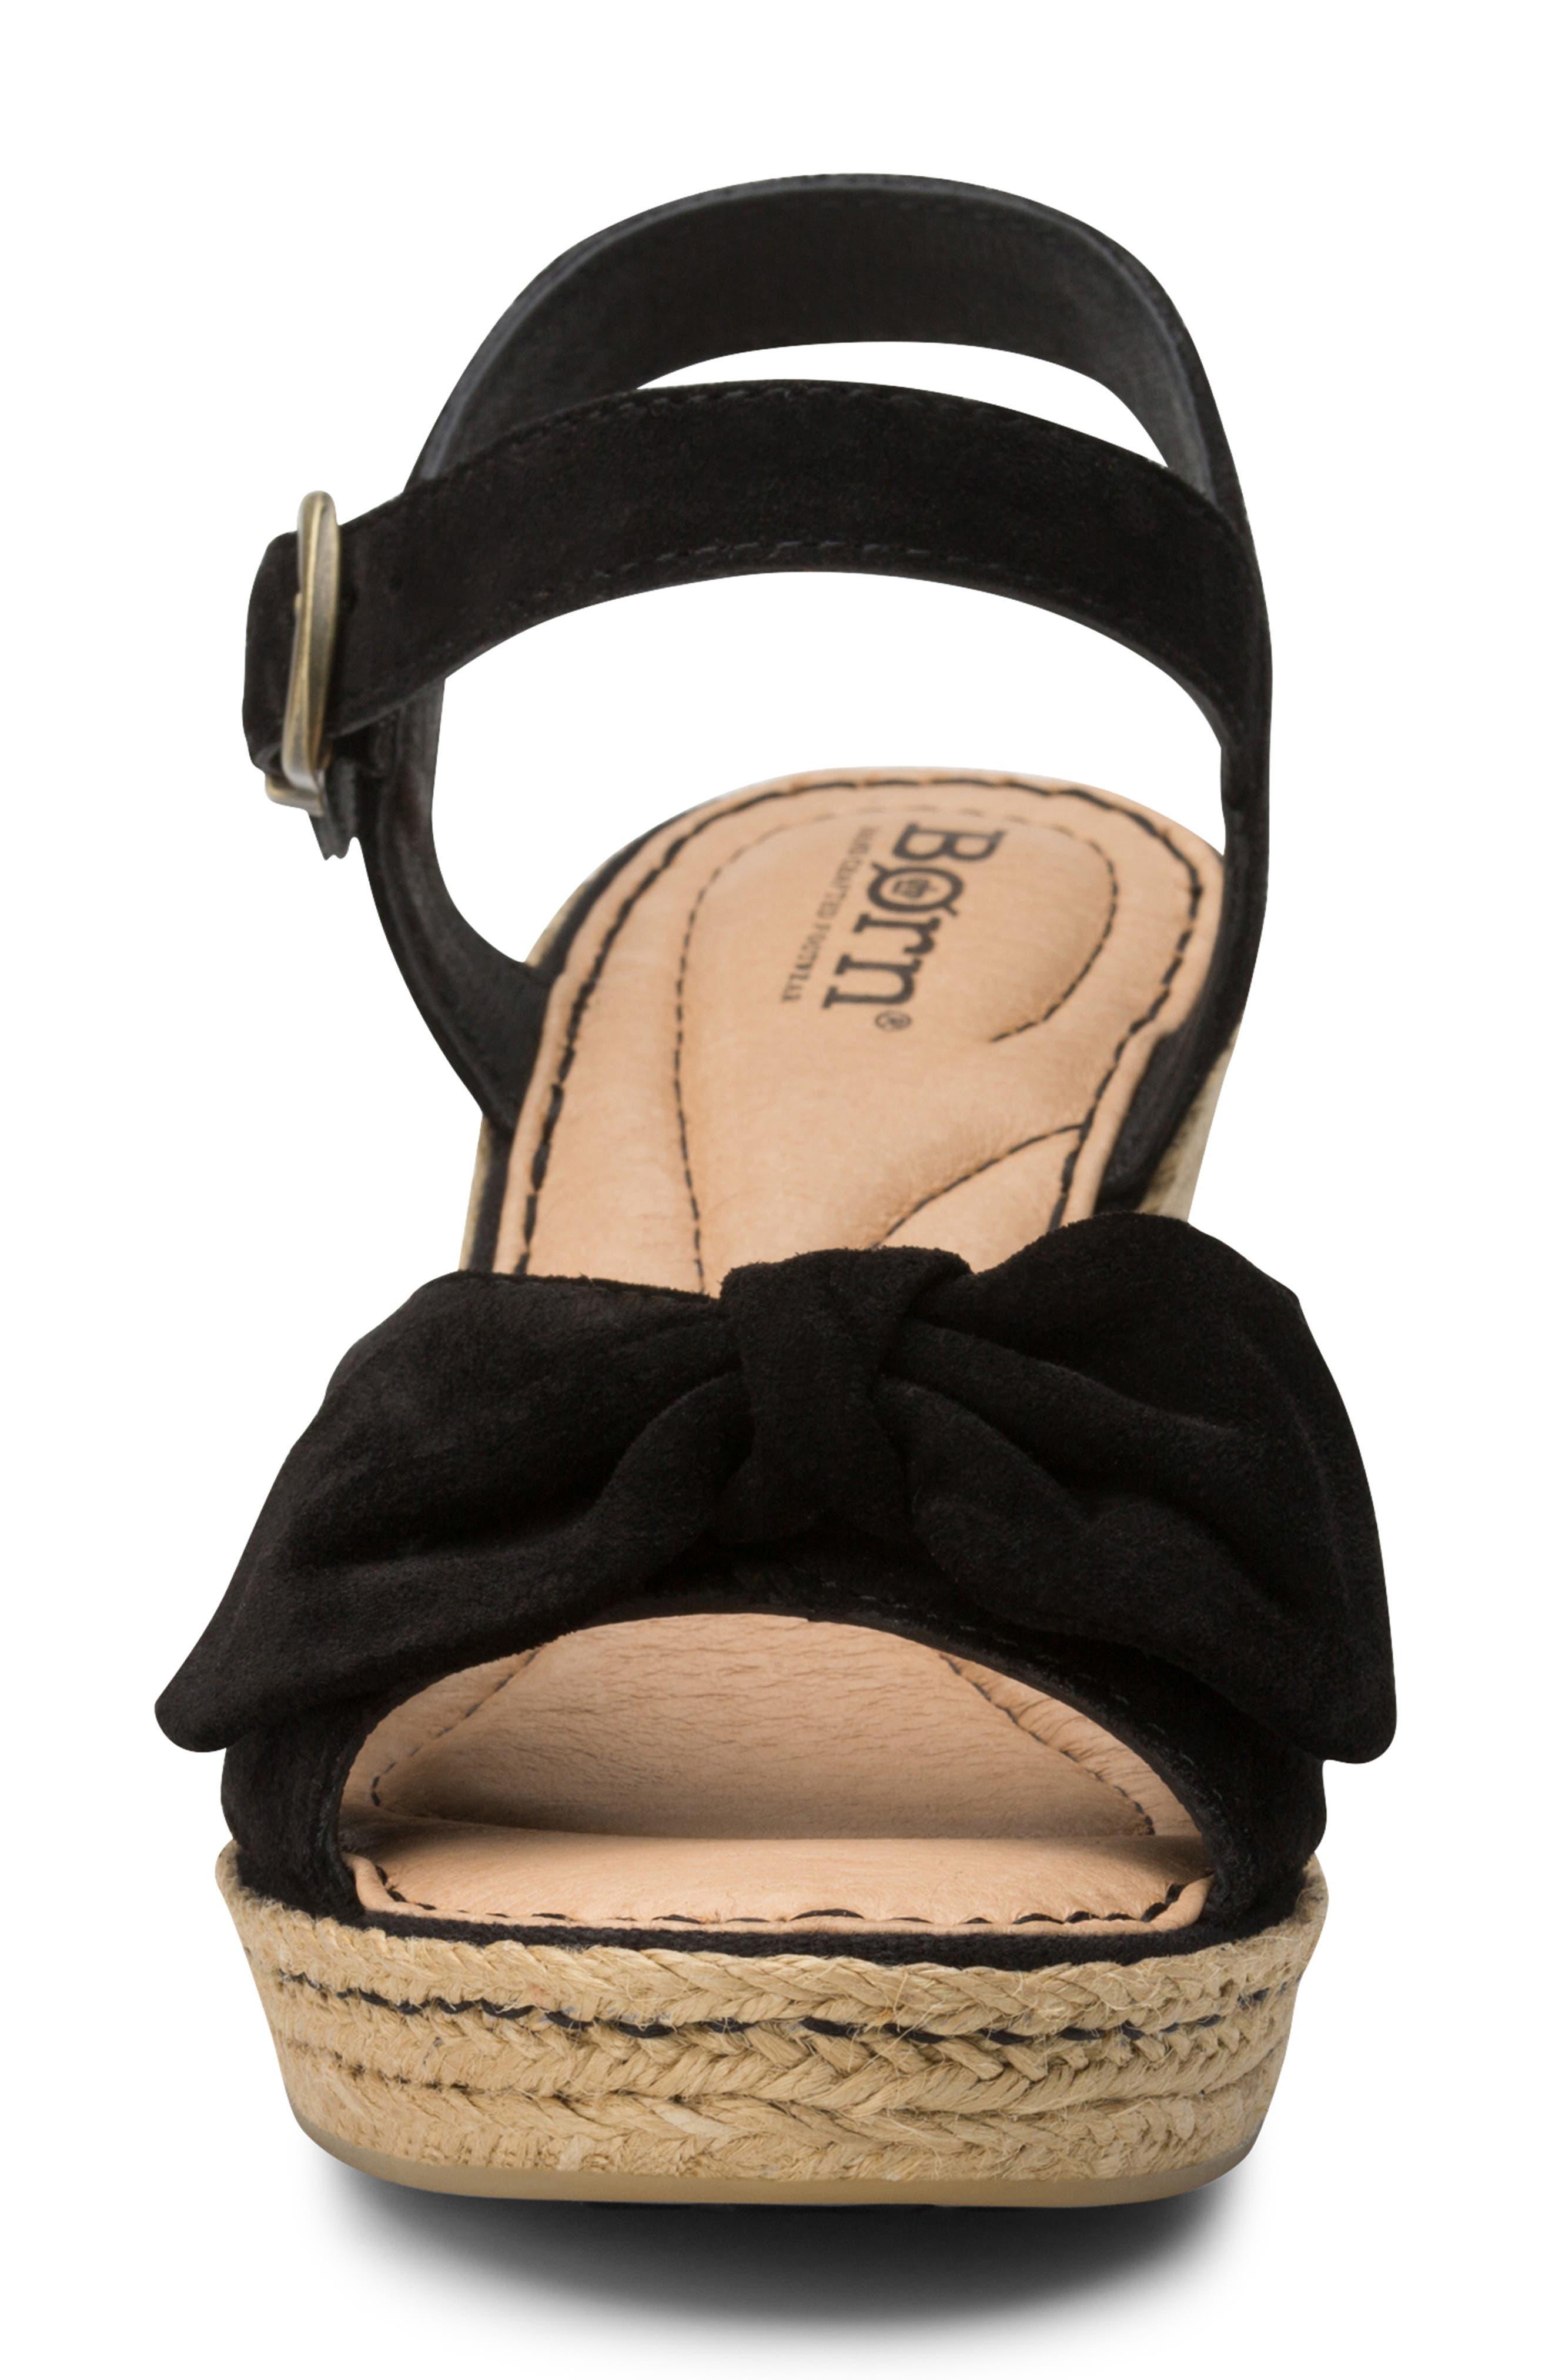 BØRN, Monticello Knotted Wedge Sandal, Alternate thumbnail 4, color, BLACK SUEDE